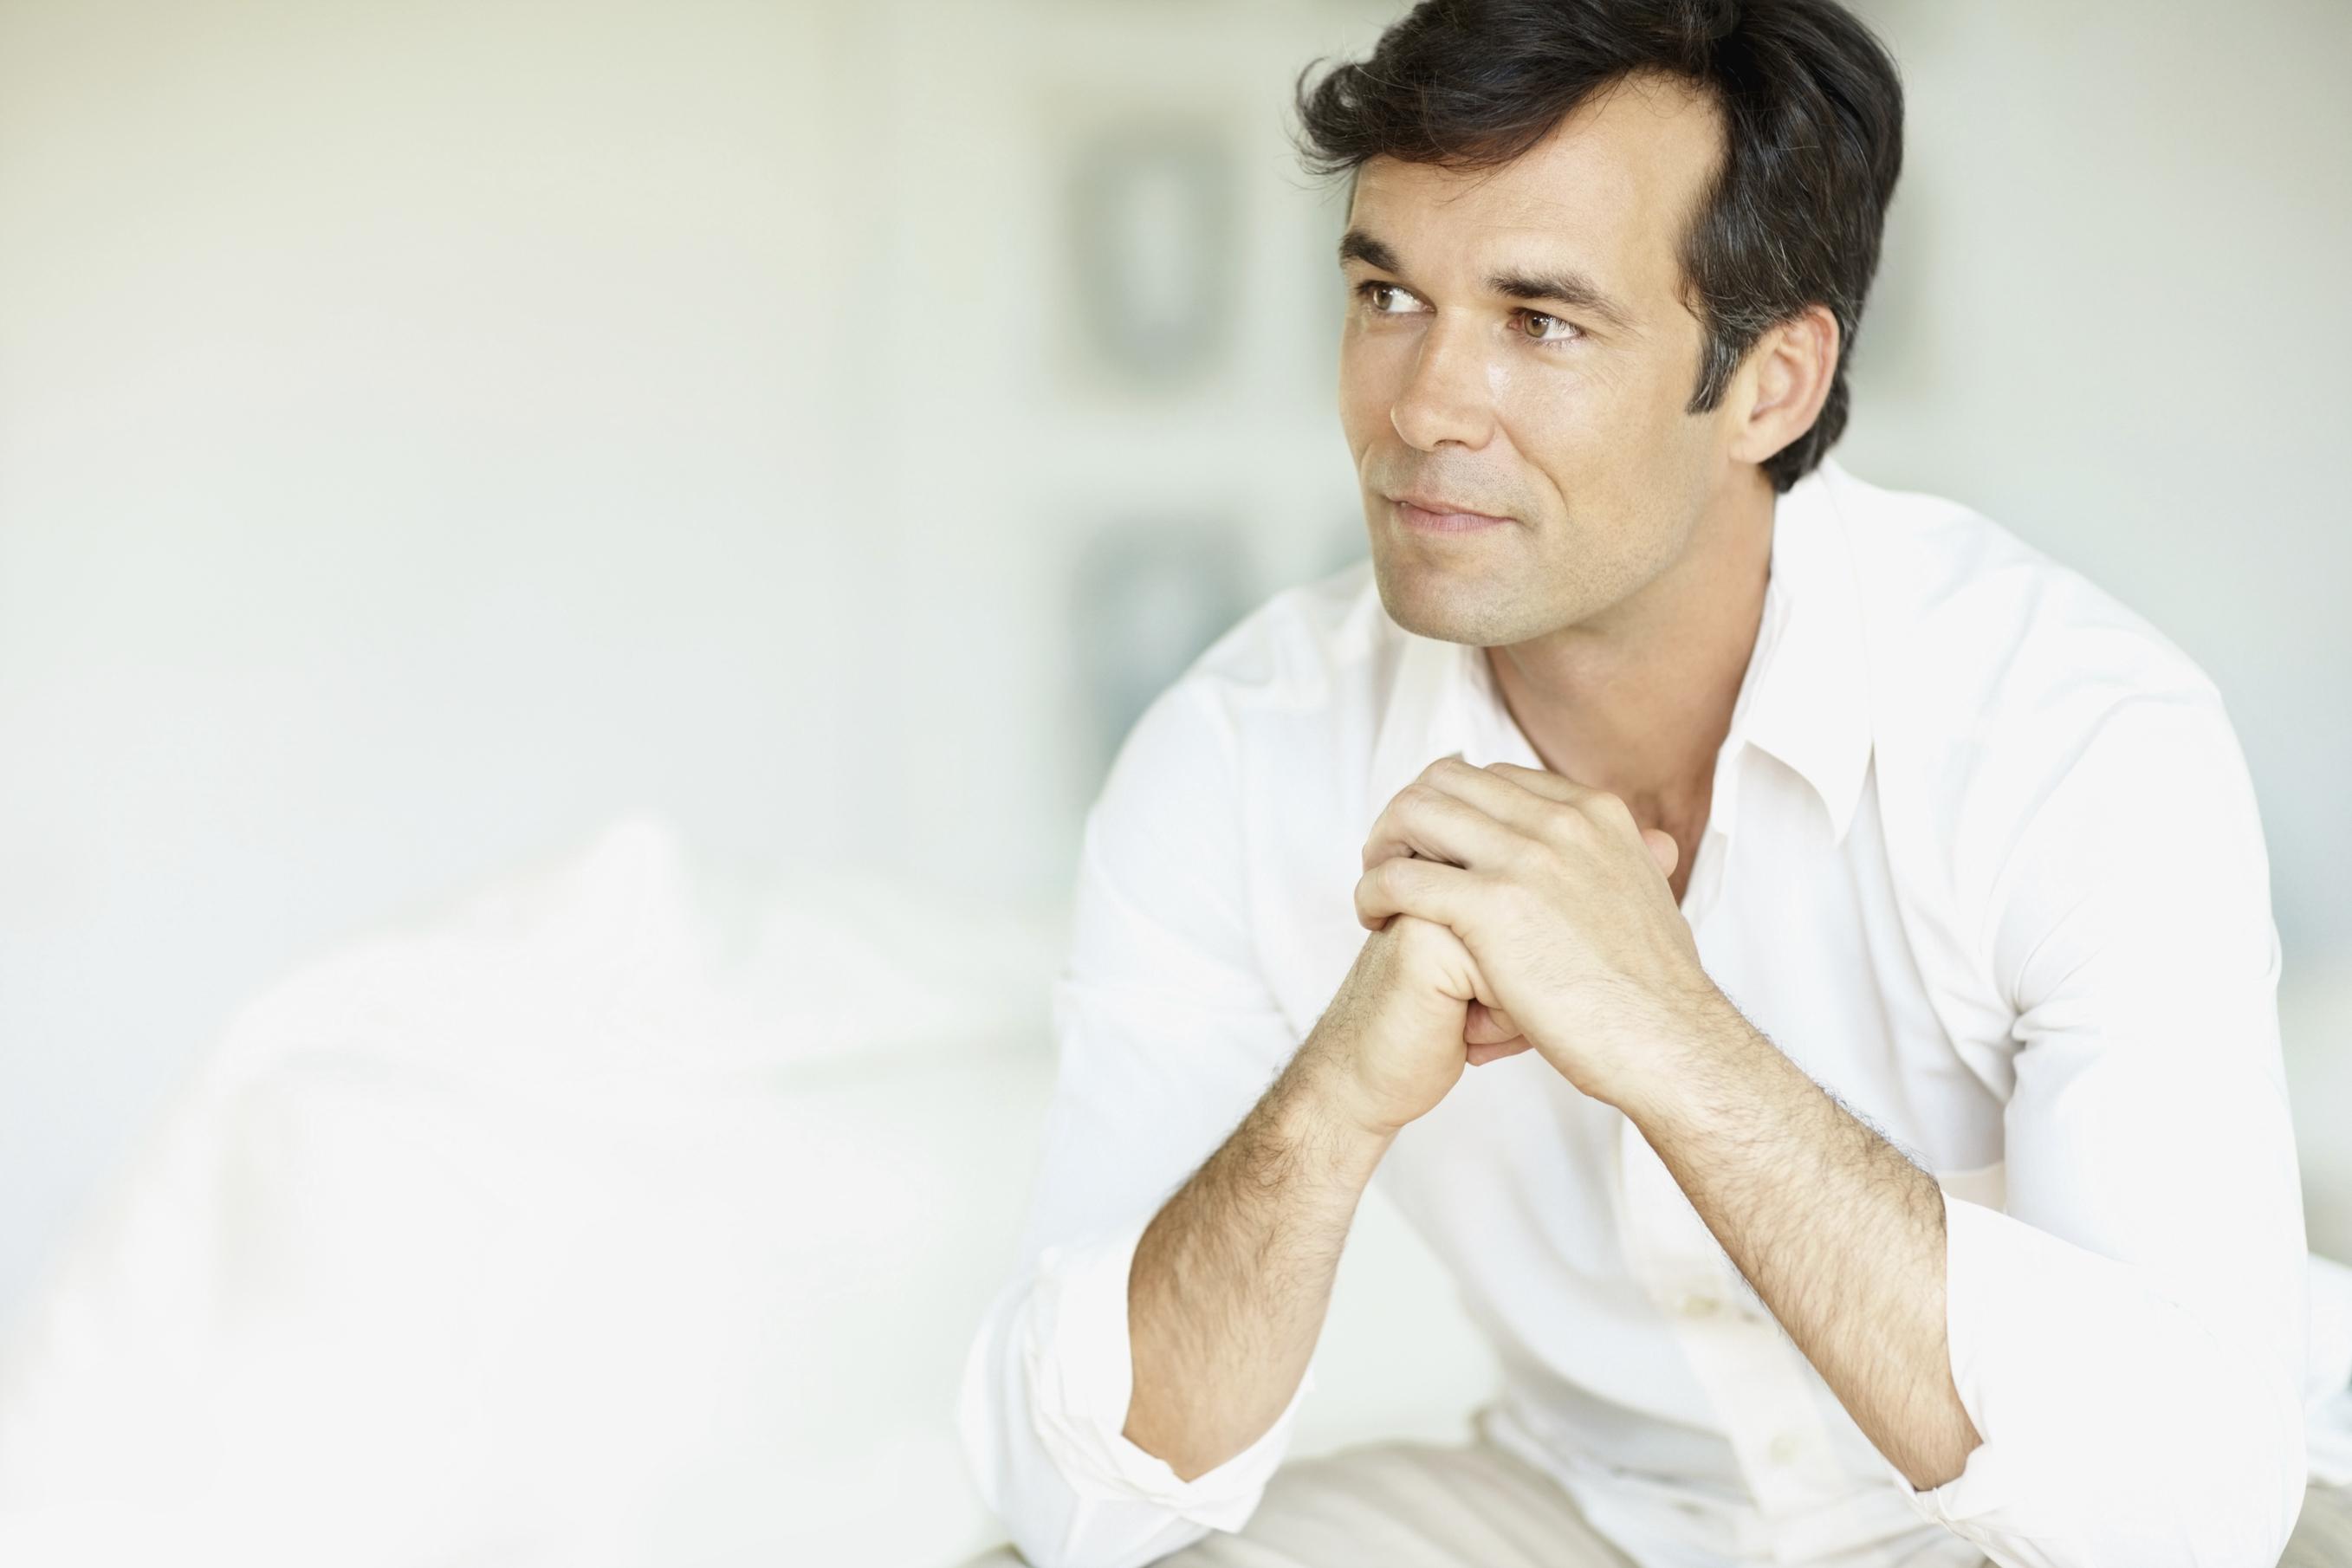 Close-up of of a contemplative mature man looking away